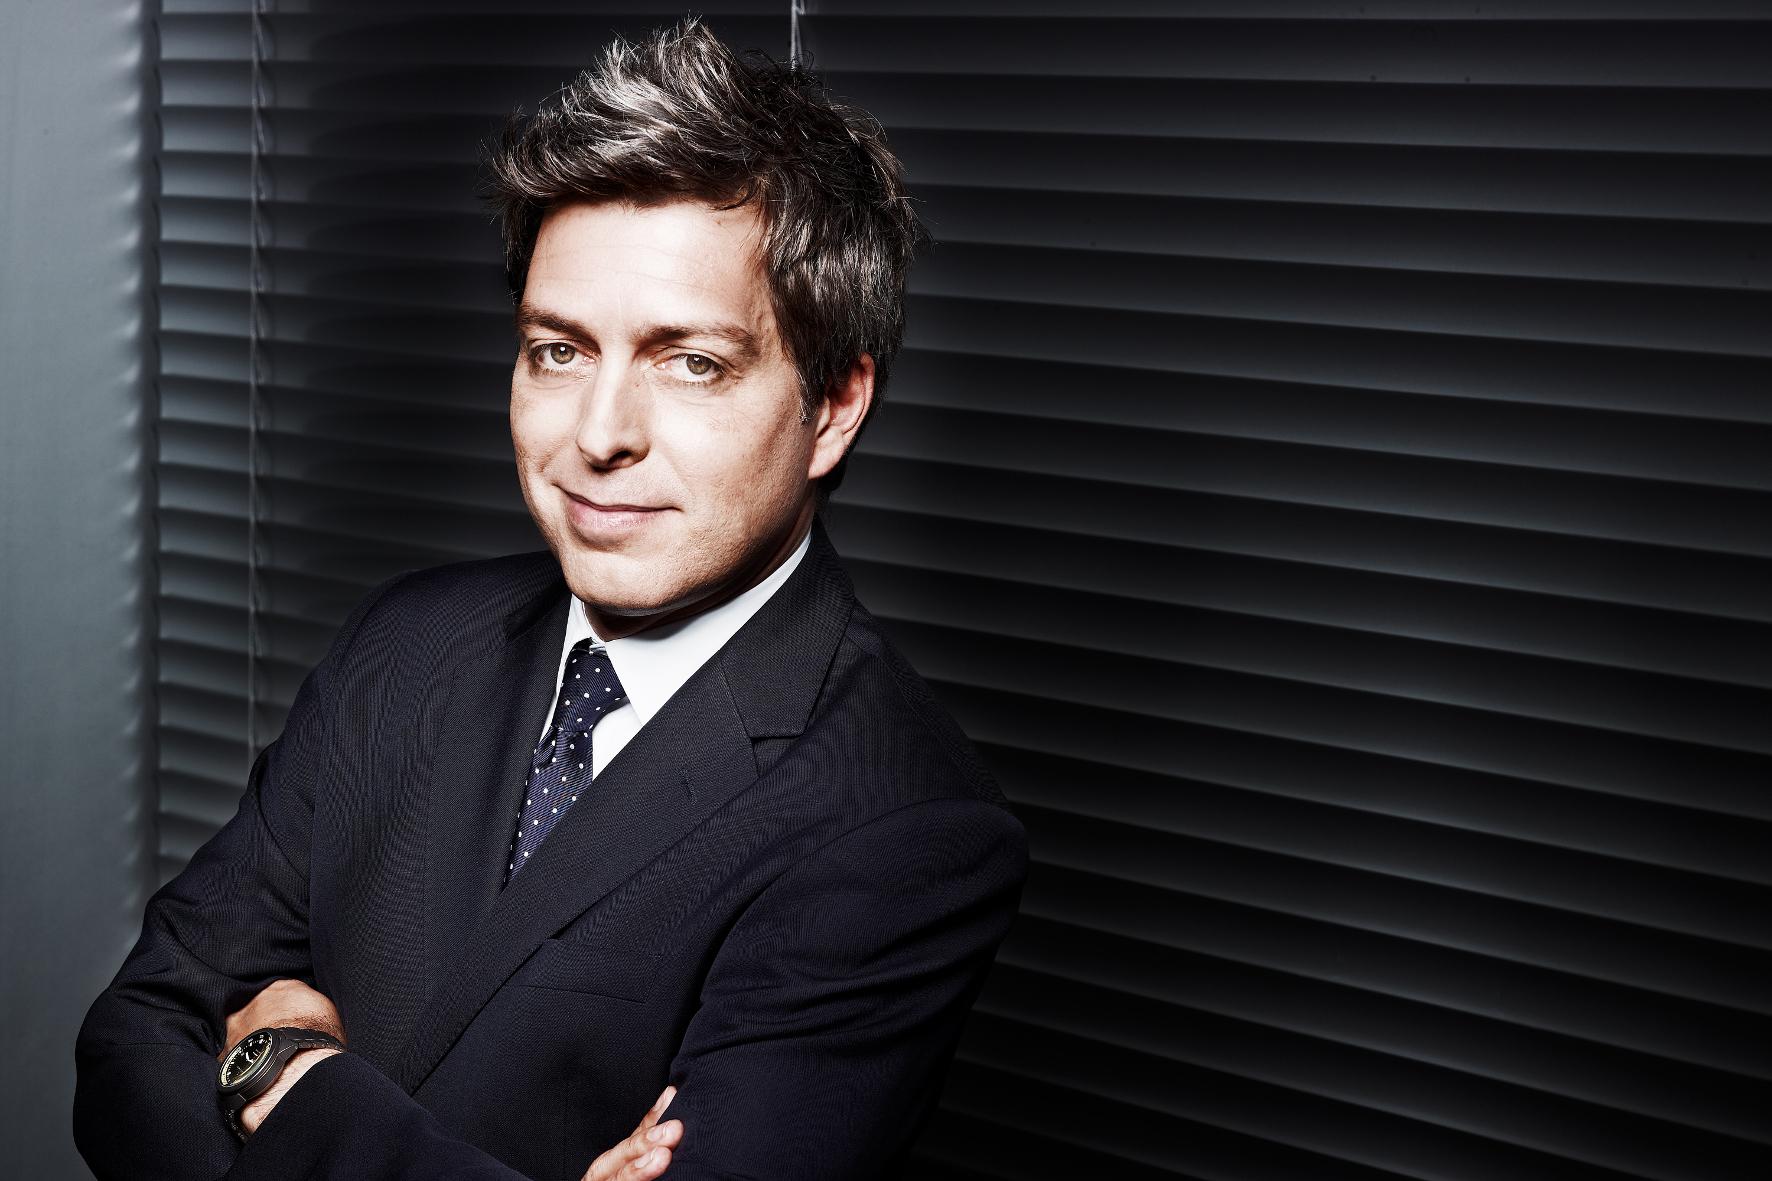 mid Paris - Herr der Ästhetik bei Kia: Chef-Designer Gregory Guillaume.